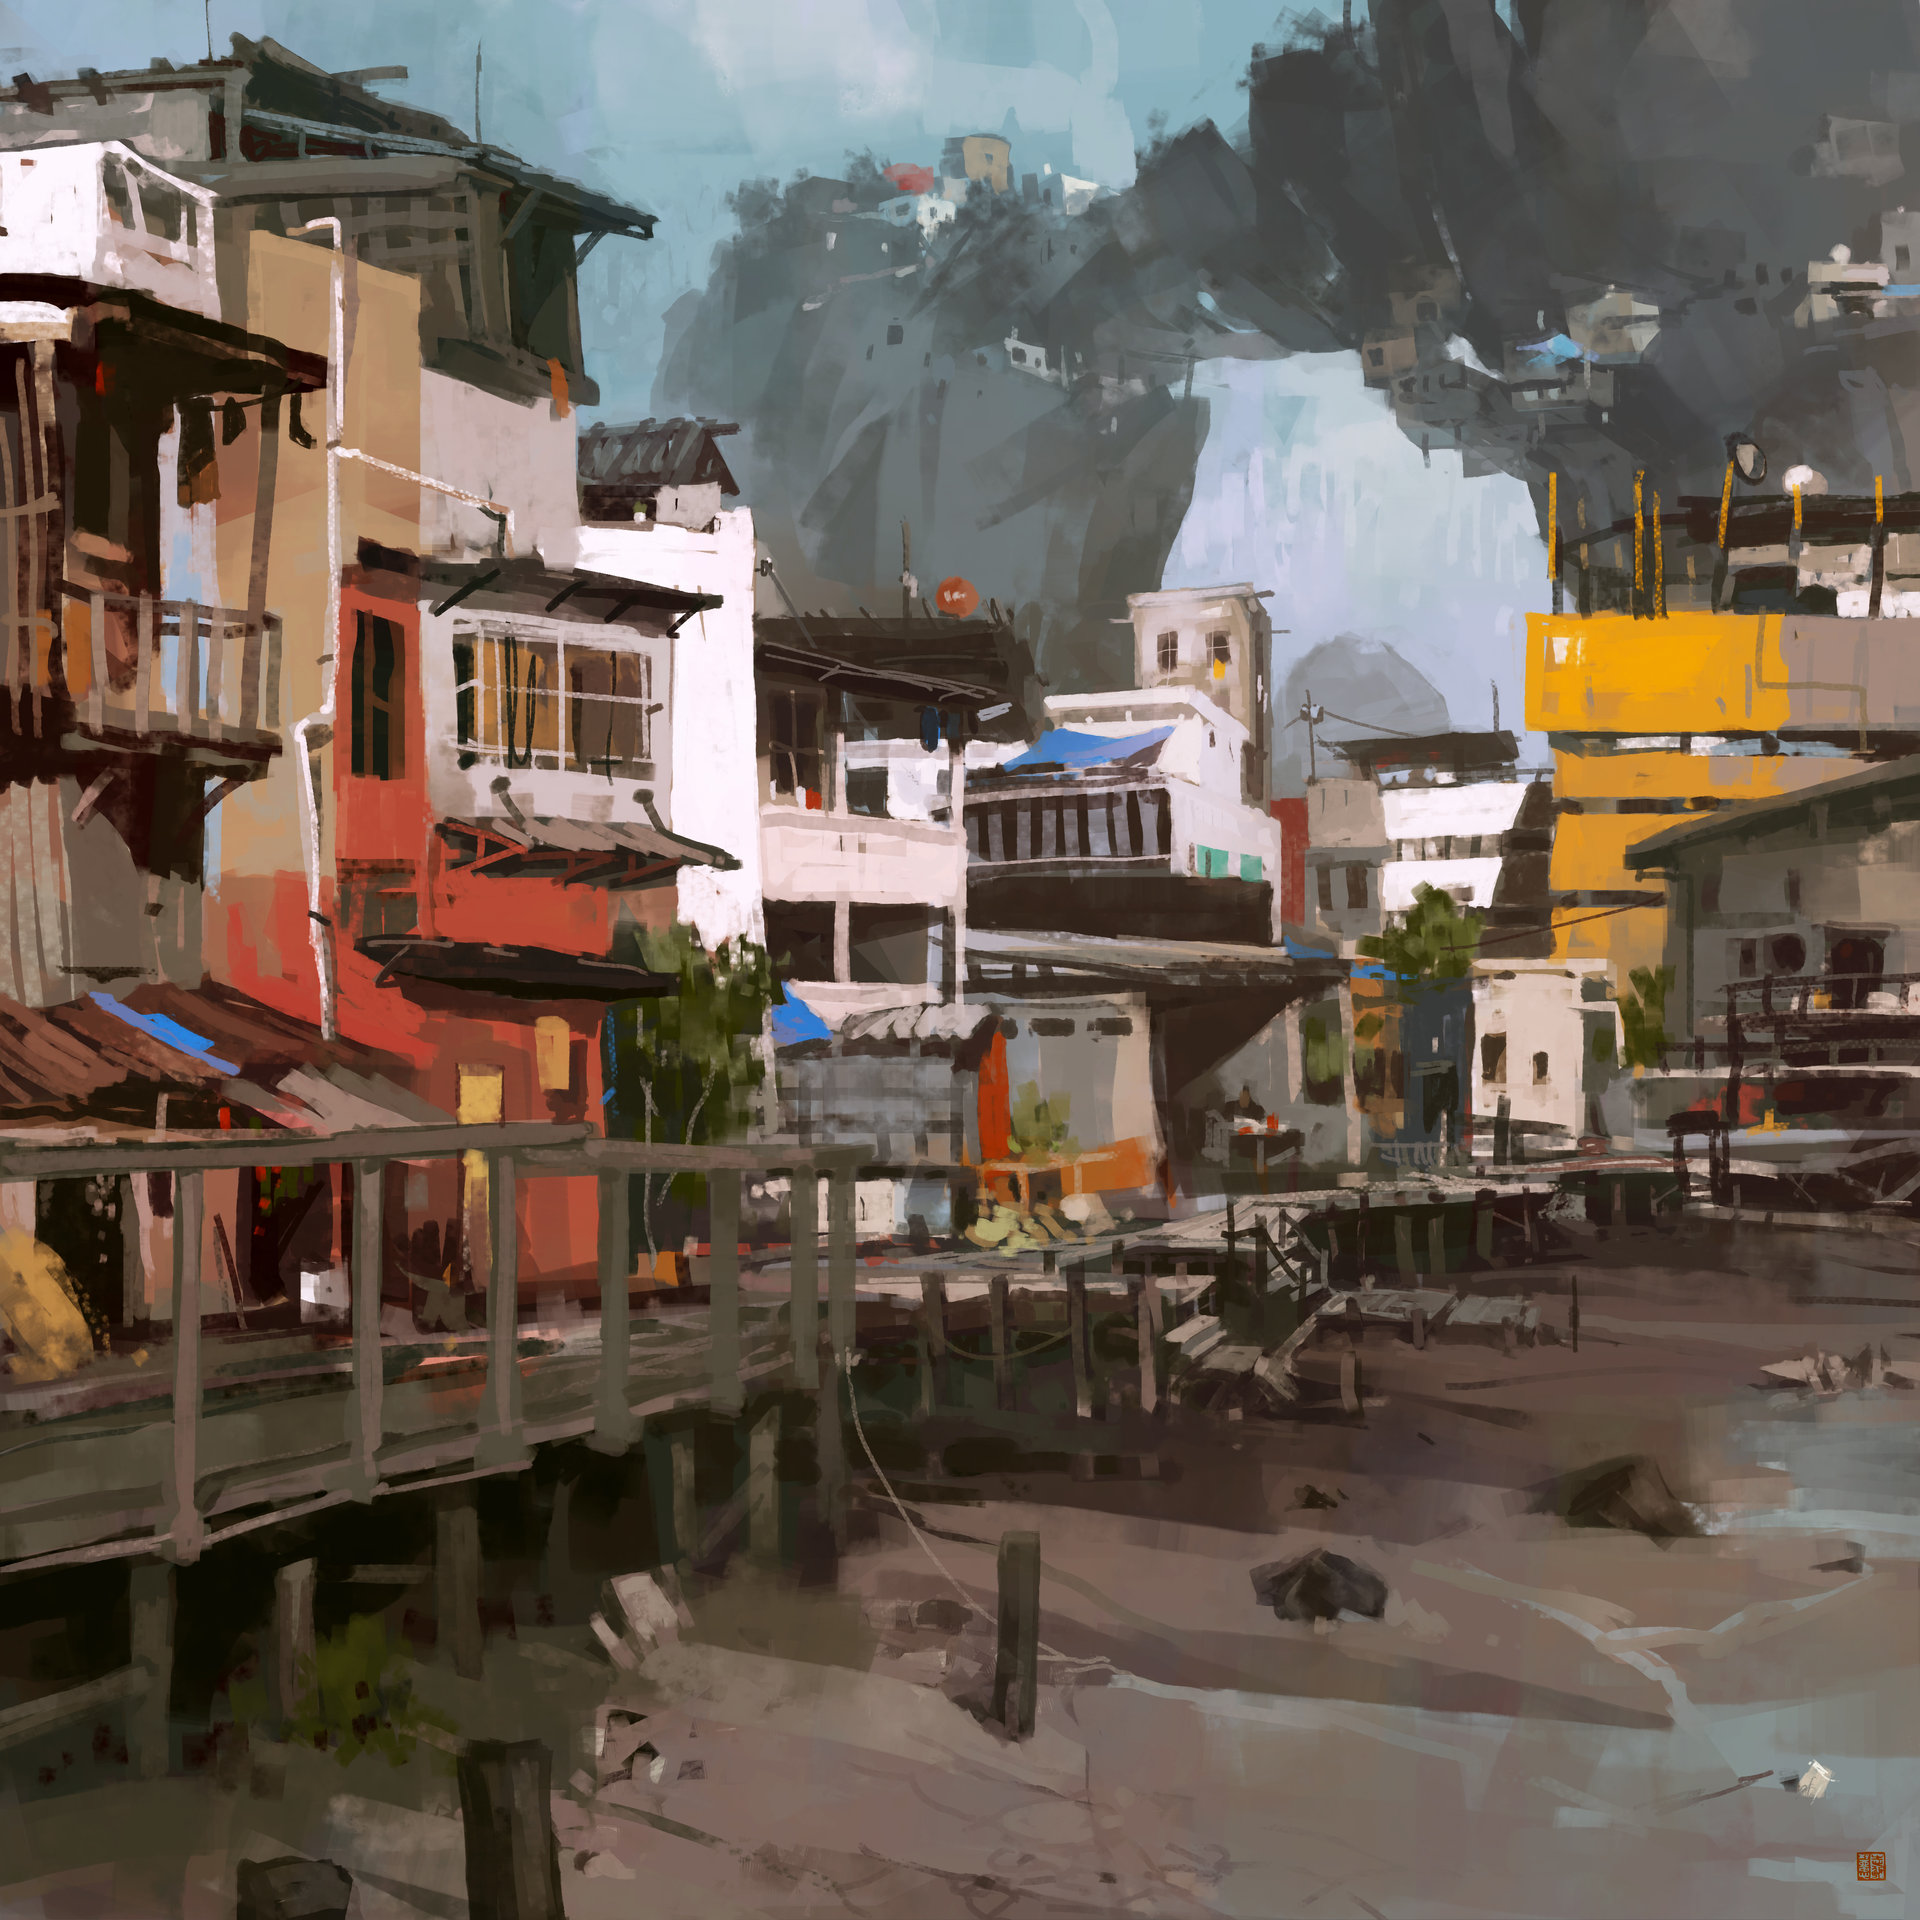 Thierry doizon bt carambola slum02